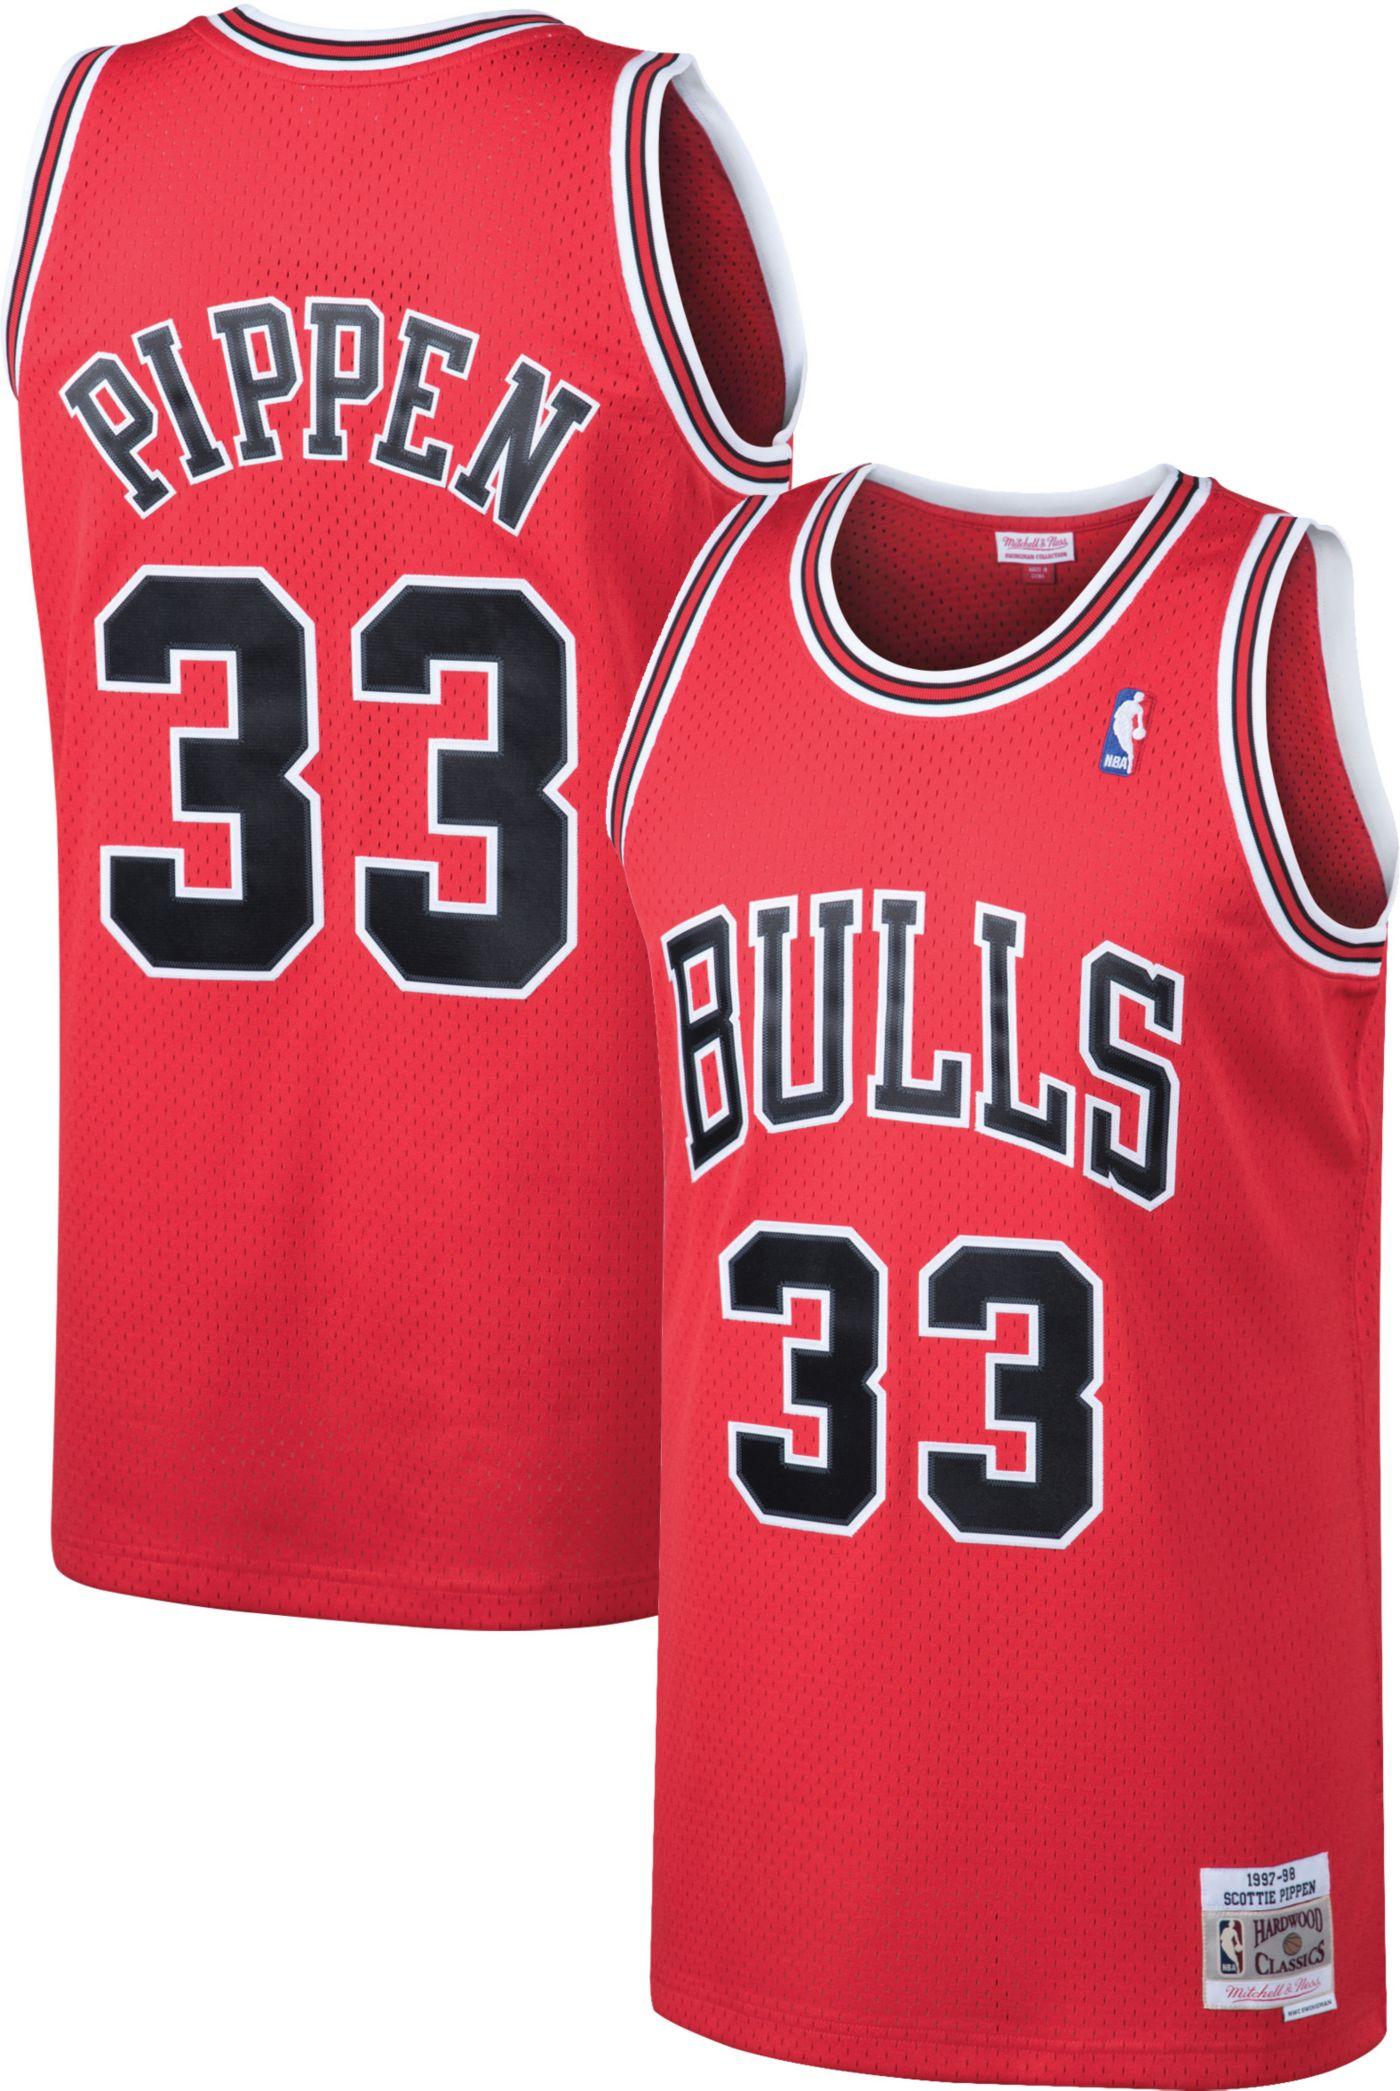 Mitchell & Ness Men's Chicago Bulls Scottie Pippen #33 Swingman Jersey